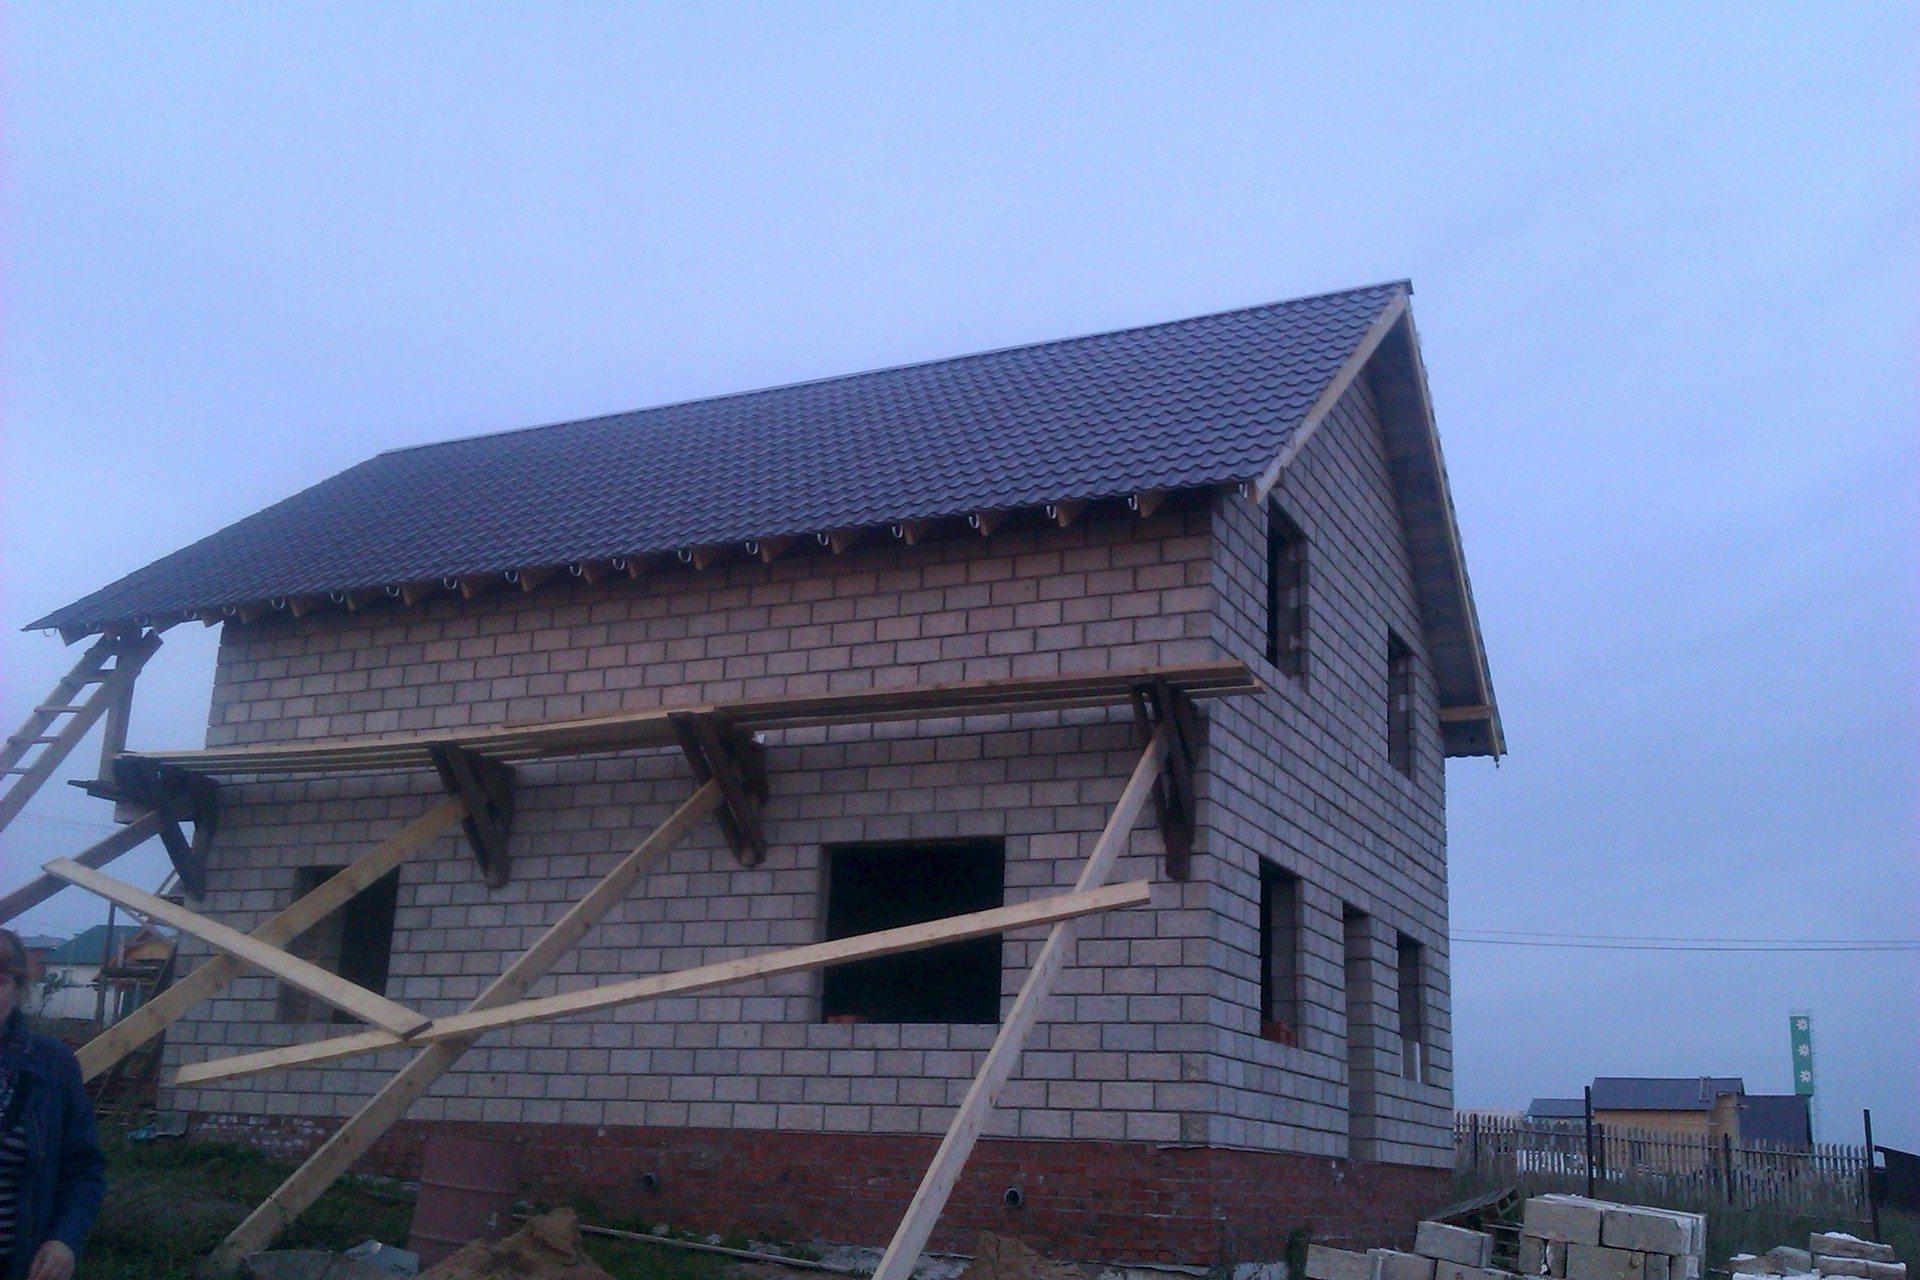 Устройство ломаной крыши своими руками шаг за шагом фото 333